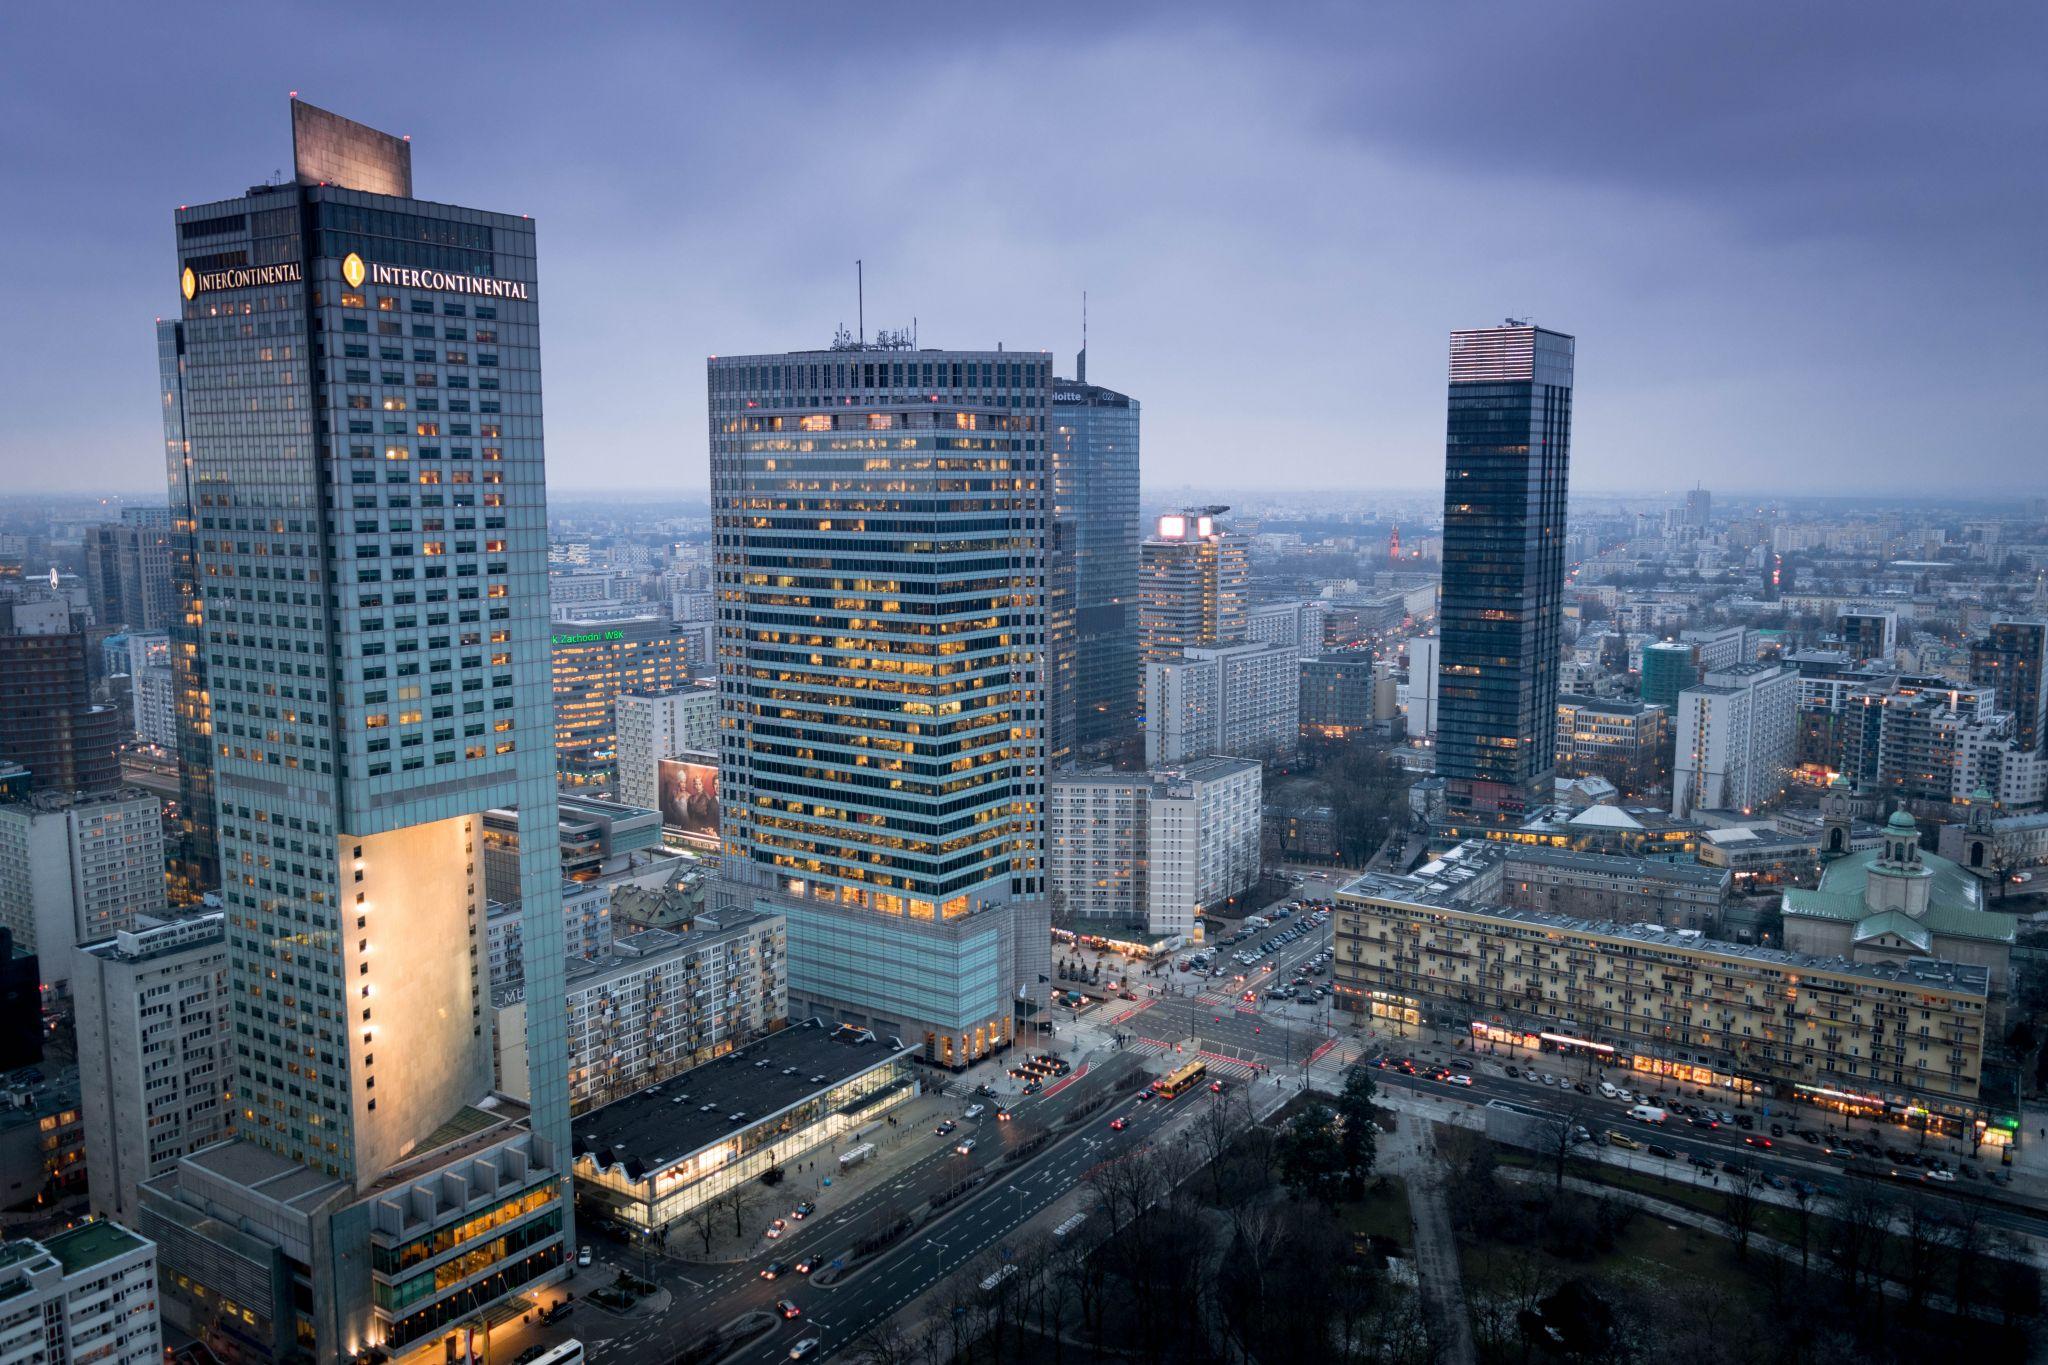 Warsaw Modern City, Poland